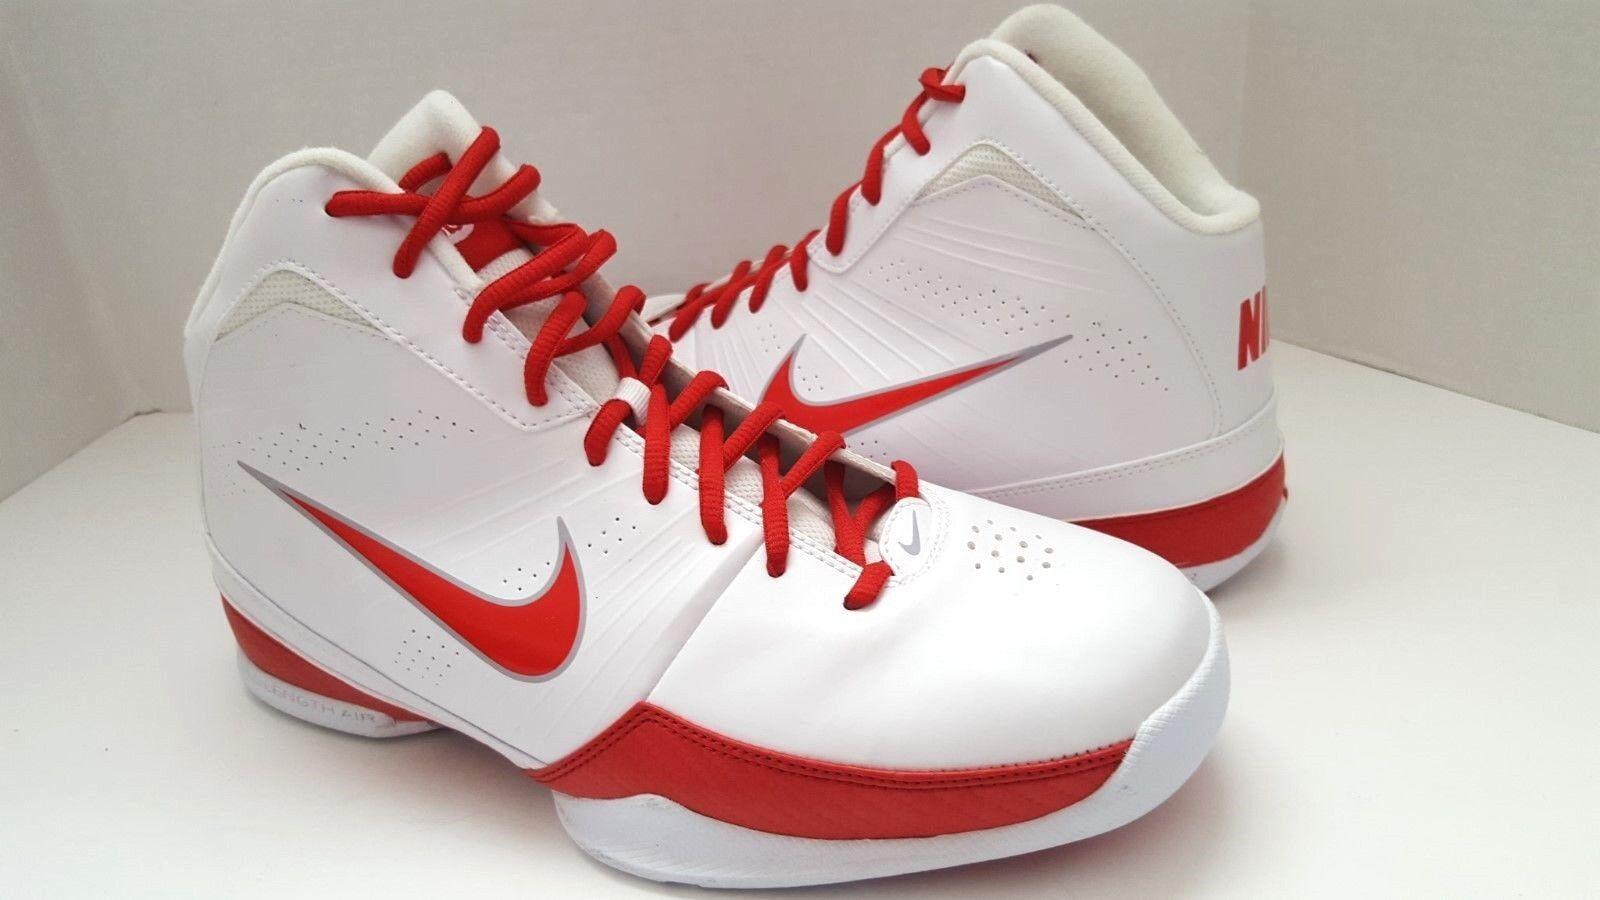 New Nike 472633-104 Uomo White/Red Basketball Shoes Sz 9